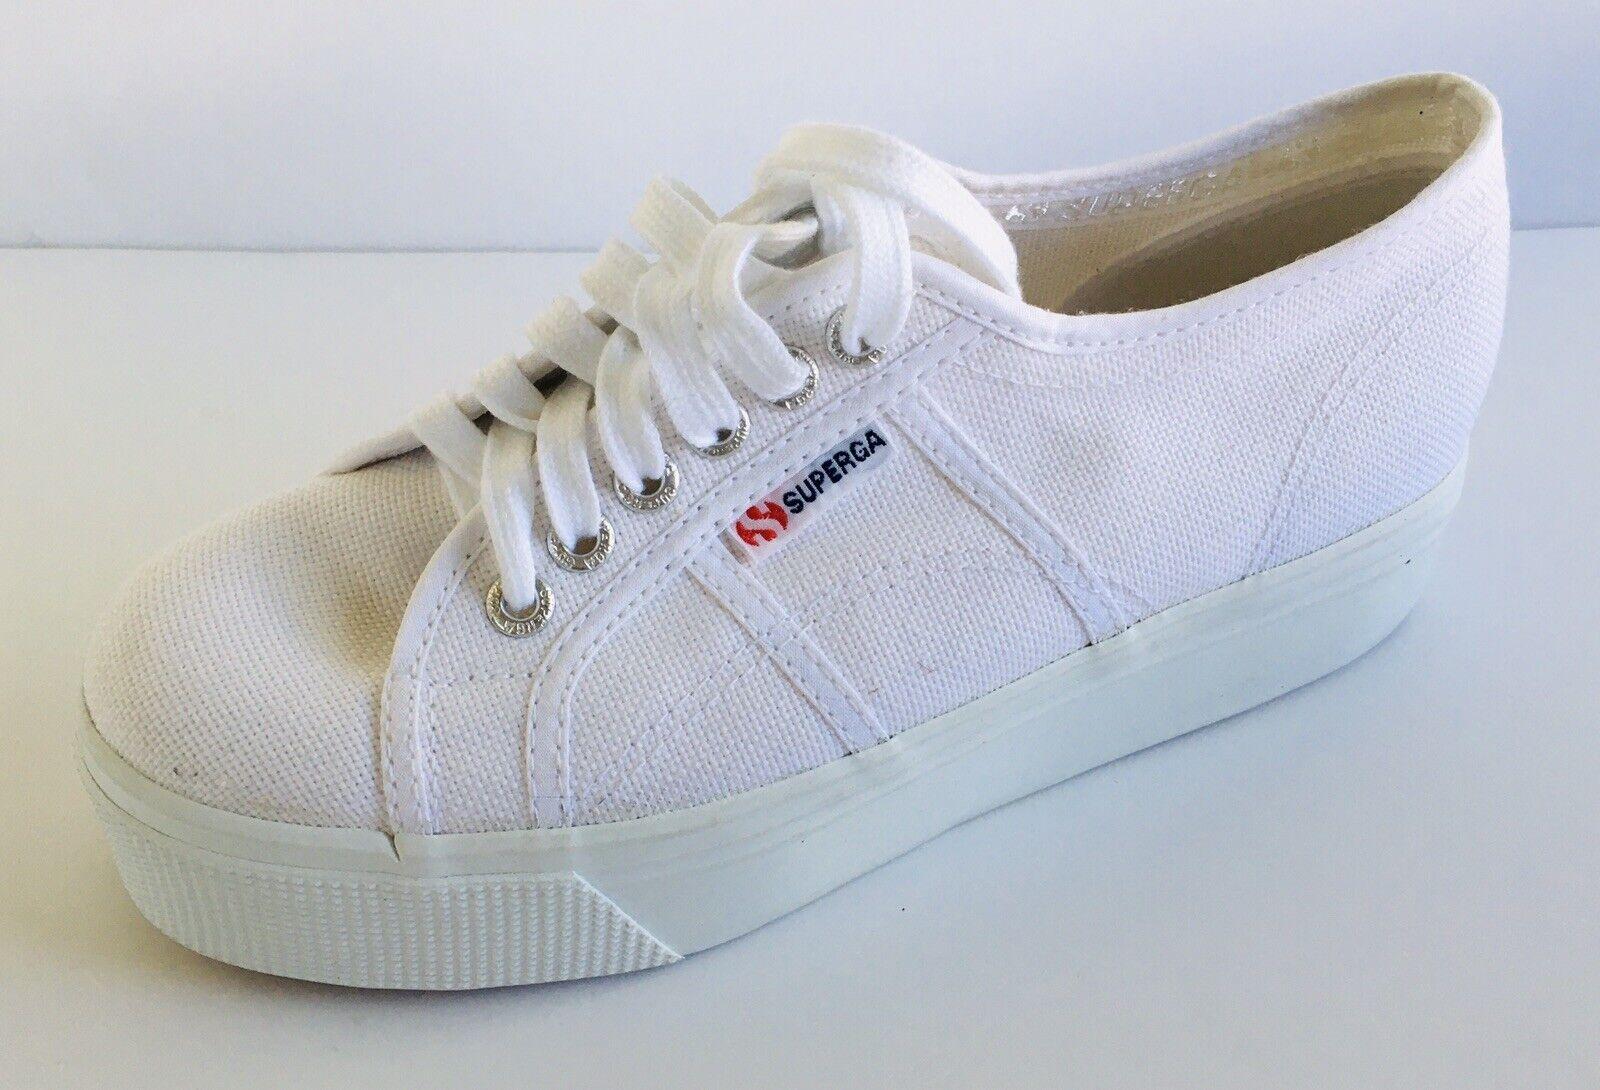 Superga COTWBIGEYELETS Platform Sneakers White Canvas Italy M6.5 W8 EU39